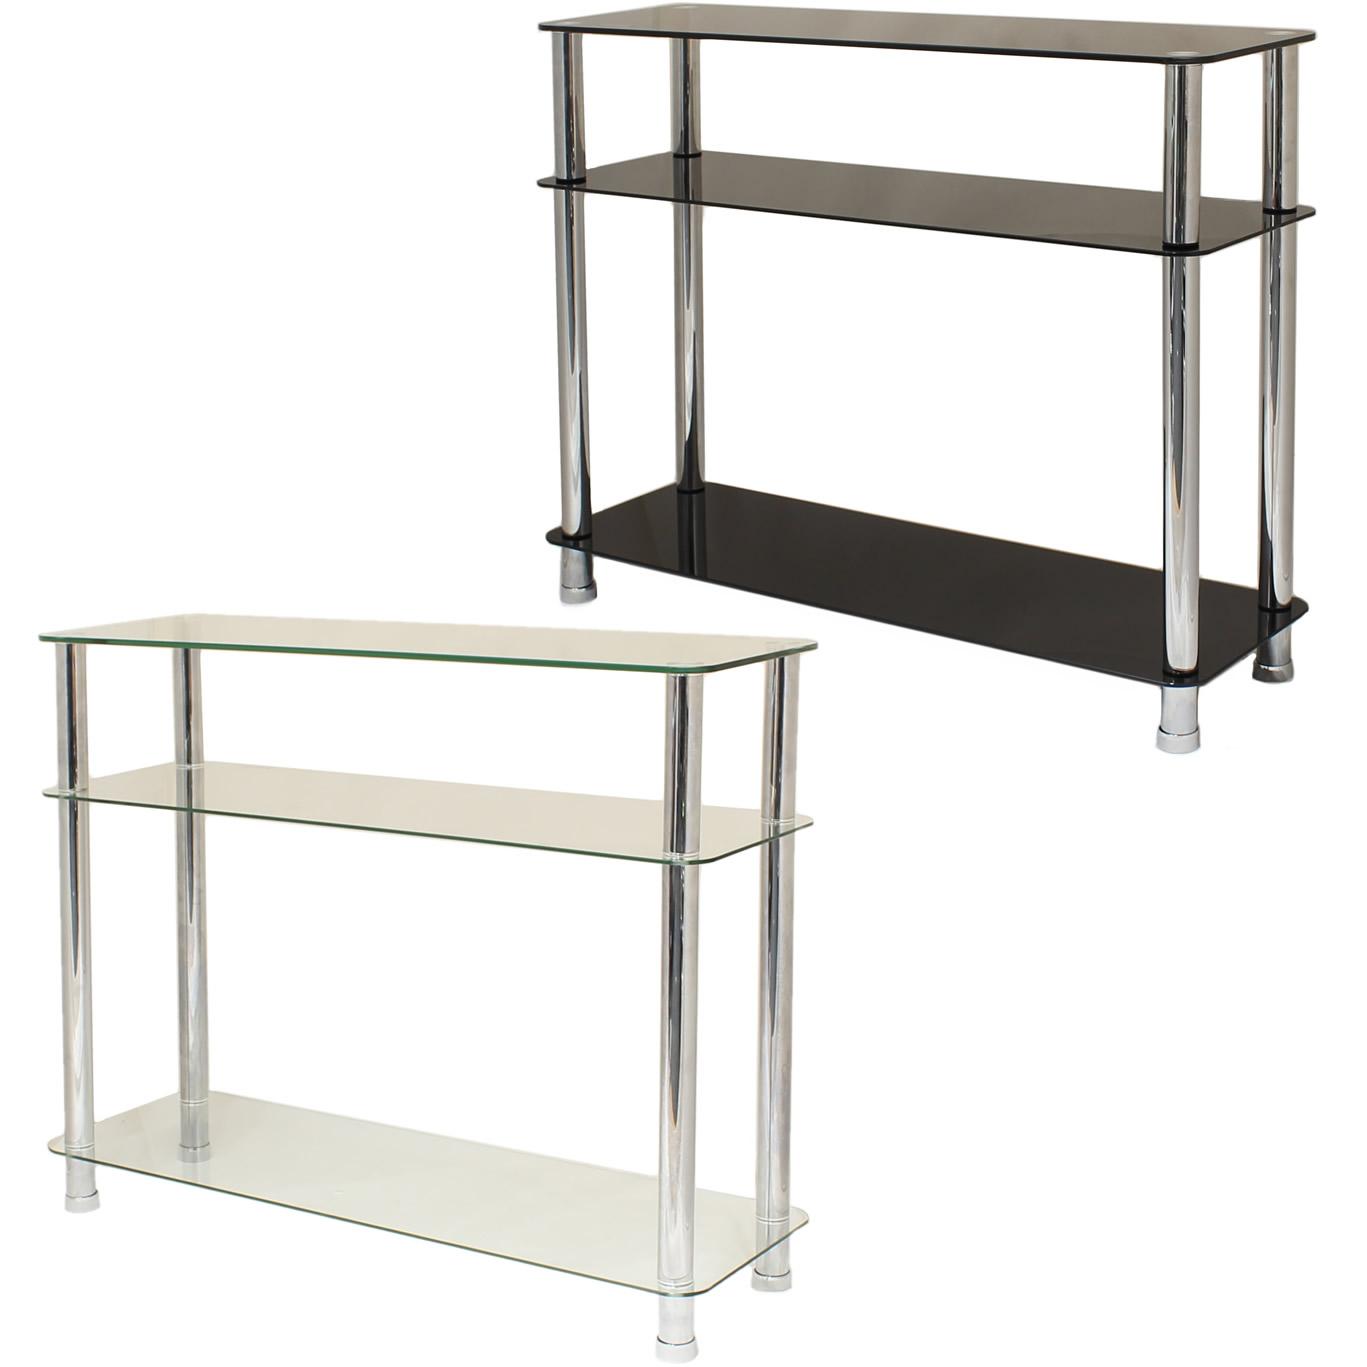 Sentinel GLASS 3 TIER SIDE/CONSOLE TABLE SHELF UNIT BEDROOM/LOUNGE/HALLWAY  STORAGE/